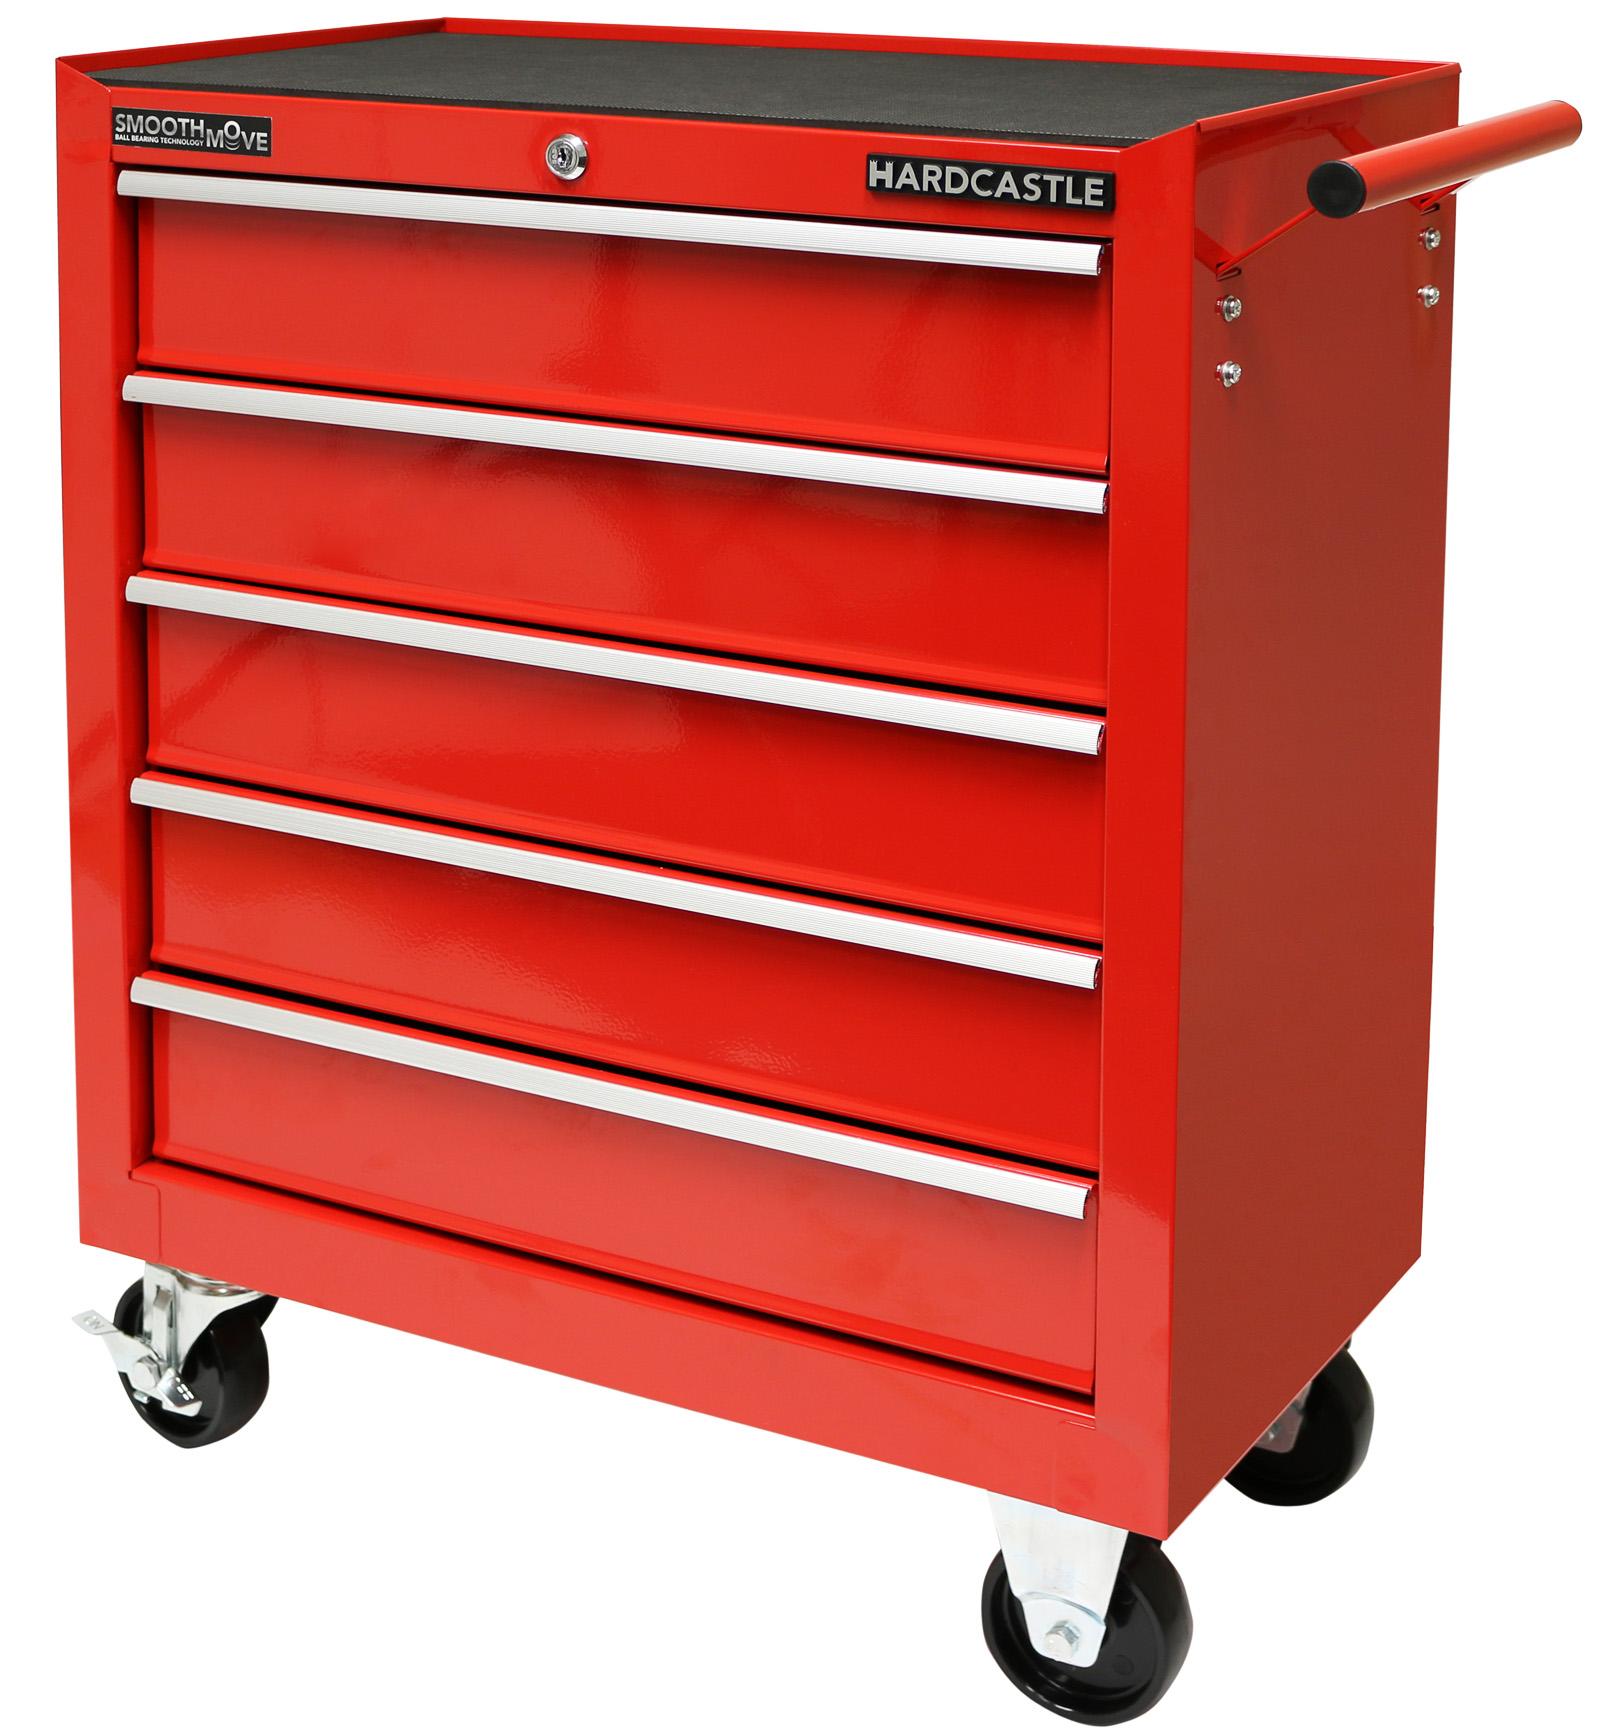 red metal 5 drawer lockable tool chest storage box roller cabinet rolling cab ebay. Black Bedroom Furniture Sets. Home Design Ideas